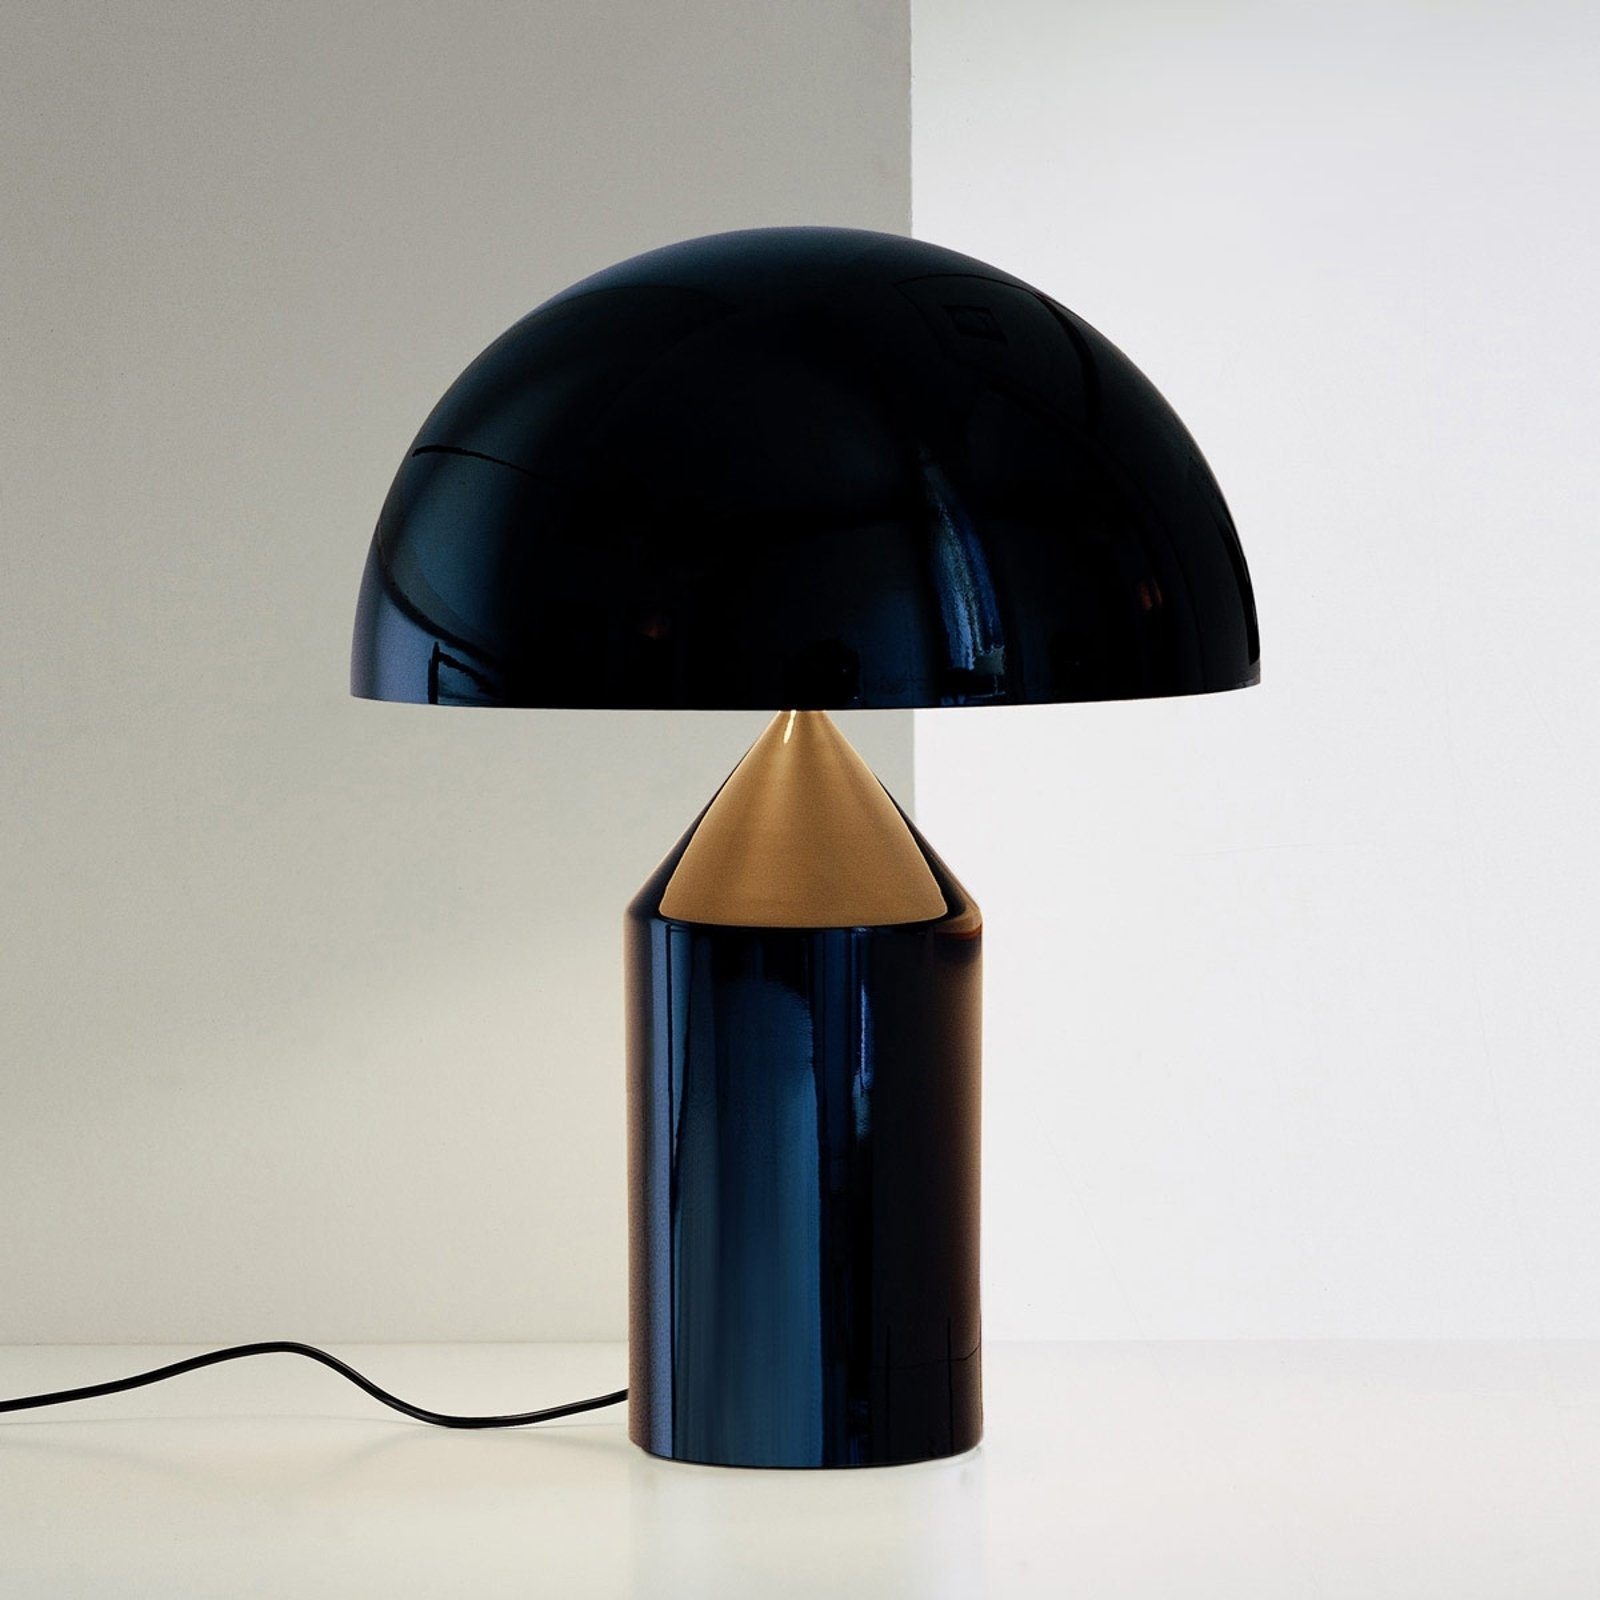 Design-bordlampe Atollo m. dimmer, svart